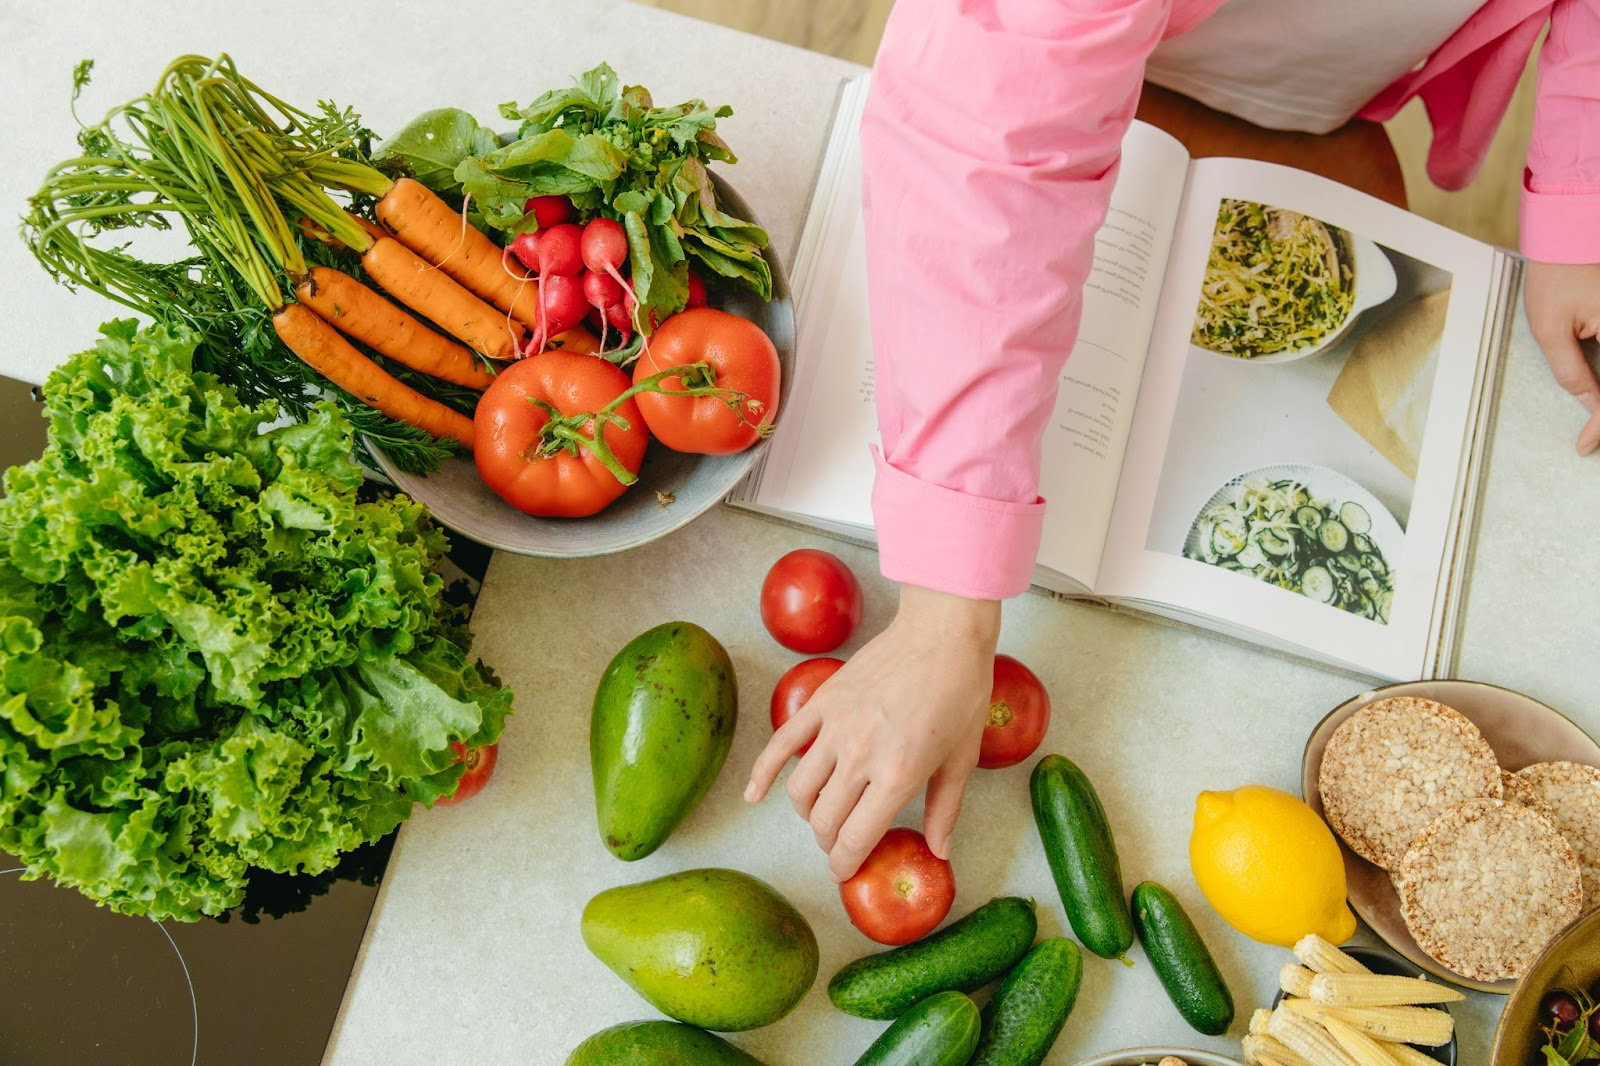 Benefits of going organic